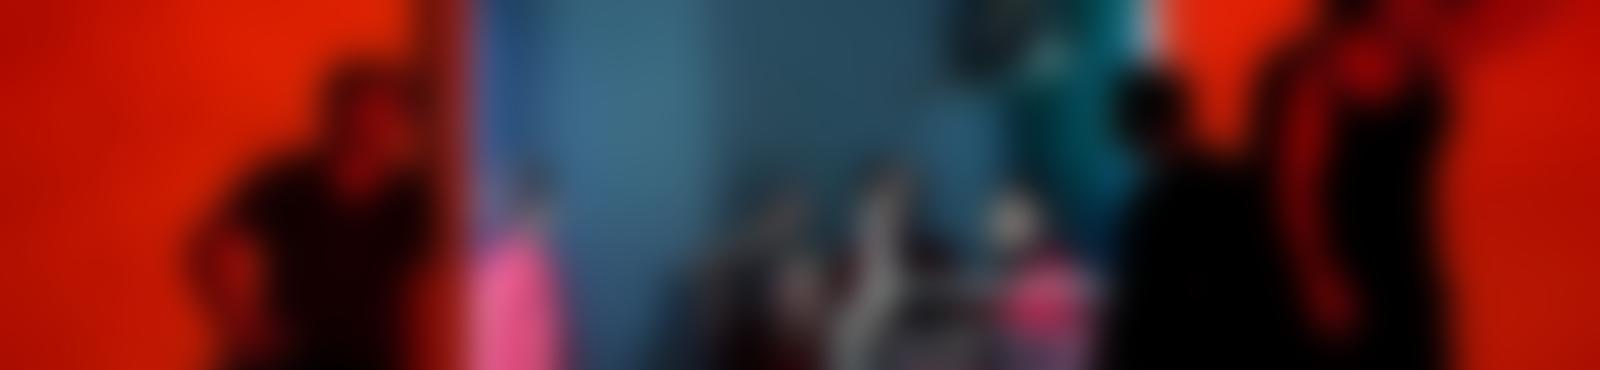 Blurred 11927deb c0b6 43ca b77a 3490935e0c0b